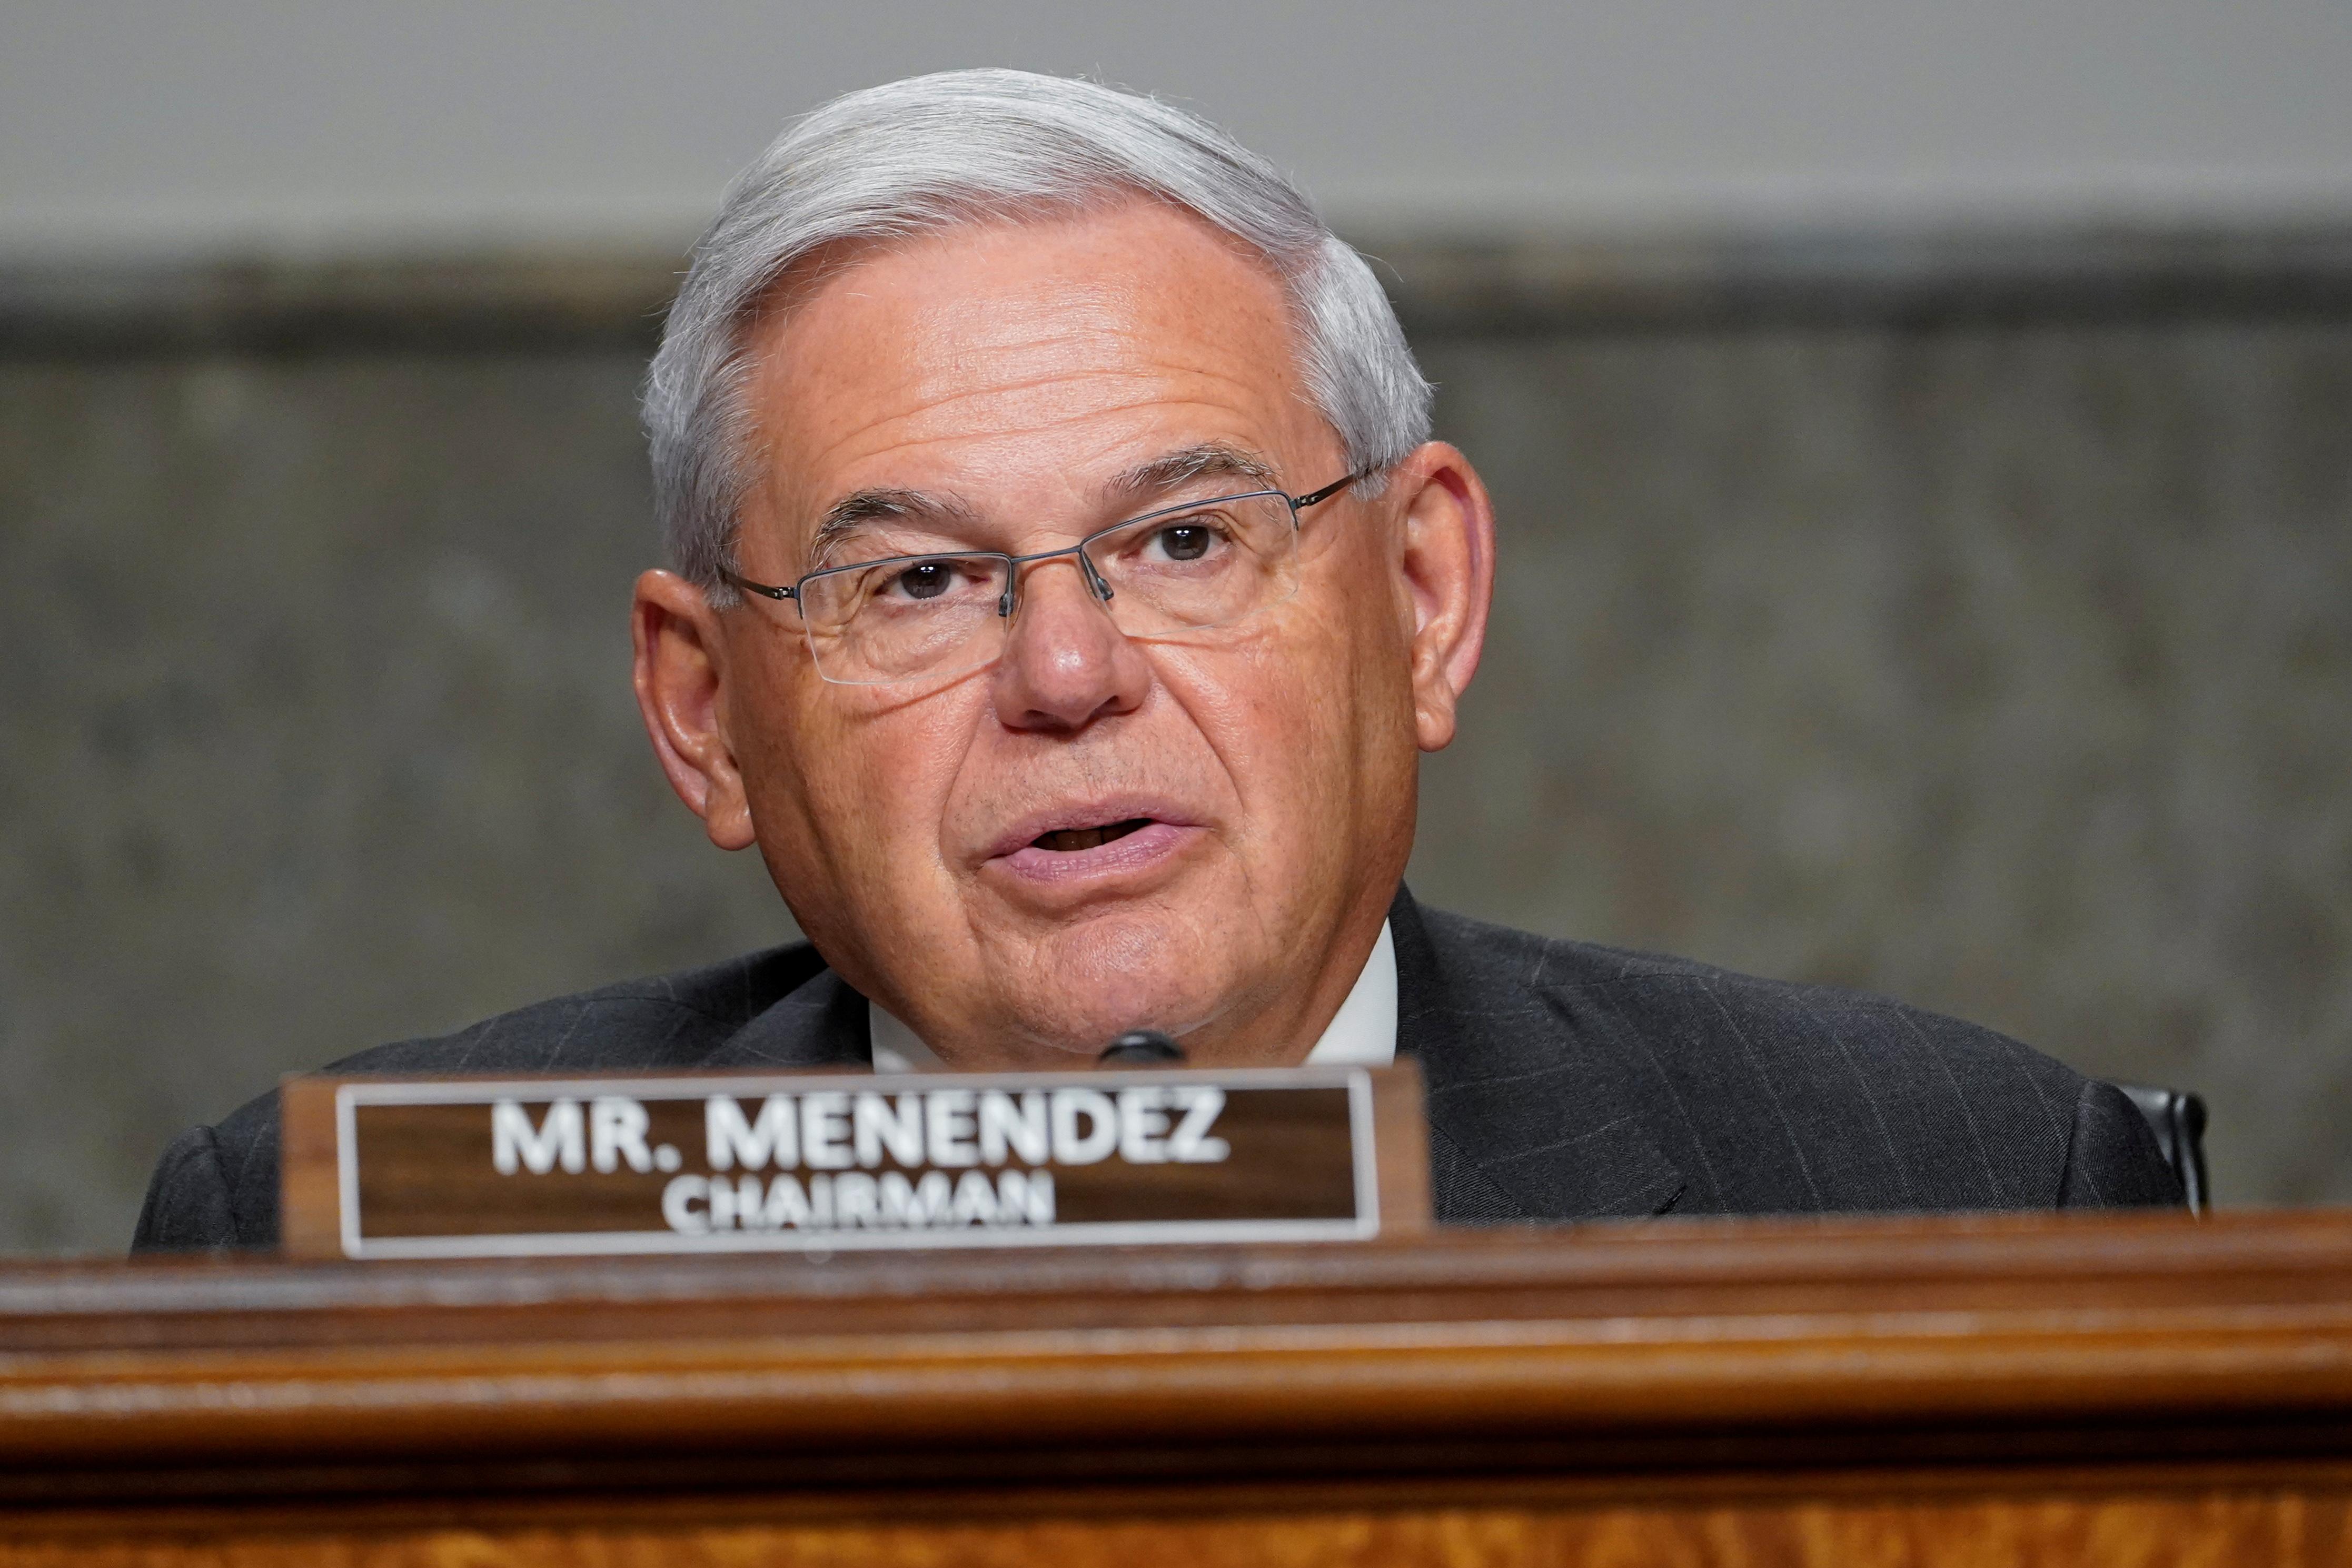 U.S. Senator Robert Menendez (D-NJ) questions Zalmay Khalilzad, special envoy for Afghanistan Reconciliation, during a Senate Foreign Relations Committee hearing on Capitol Hill in Washington, U.S., April 27, 2021. Susan Walsh/Pool via REUTERS